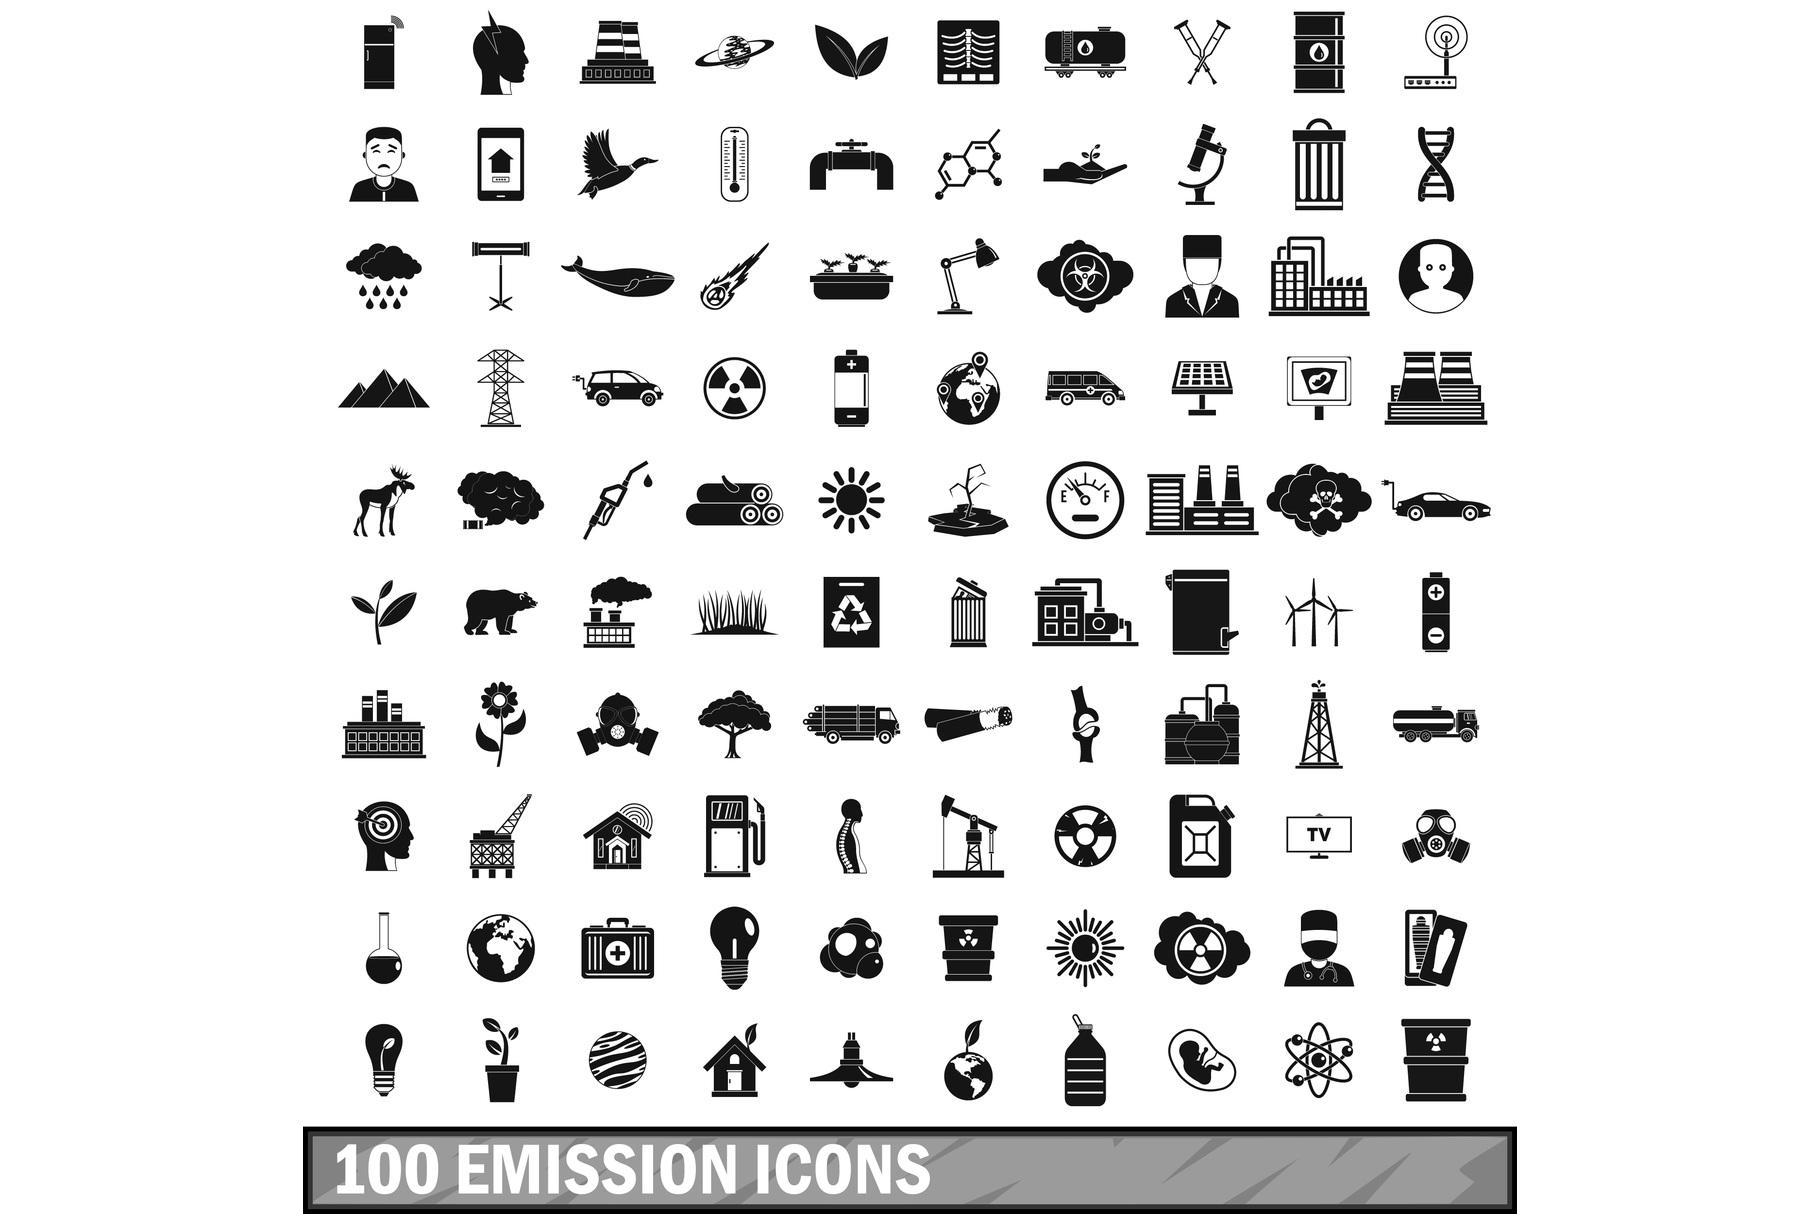 100 emission icons set, simple style example image 1